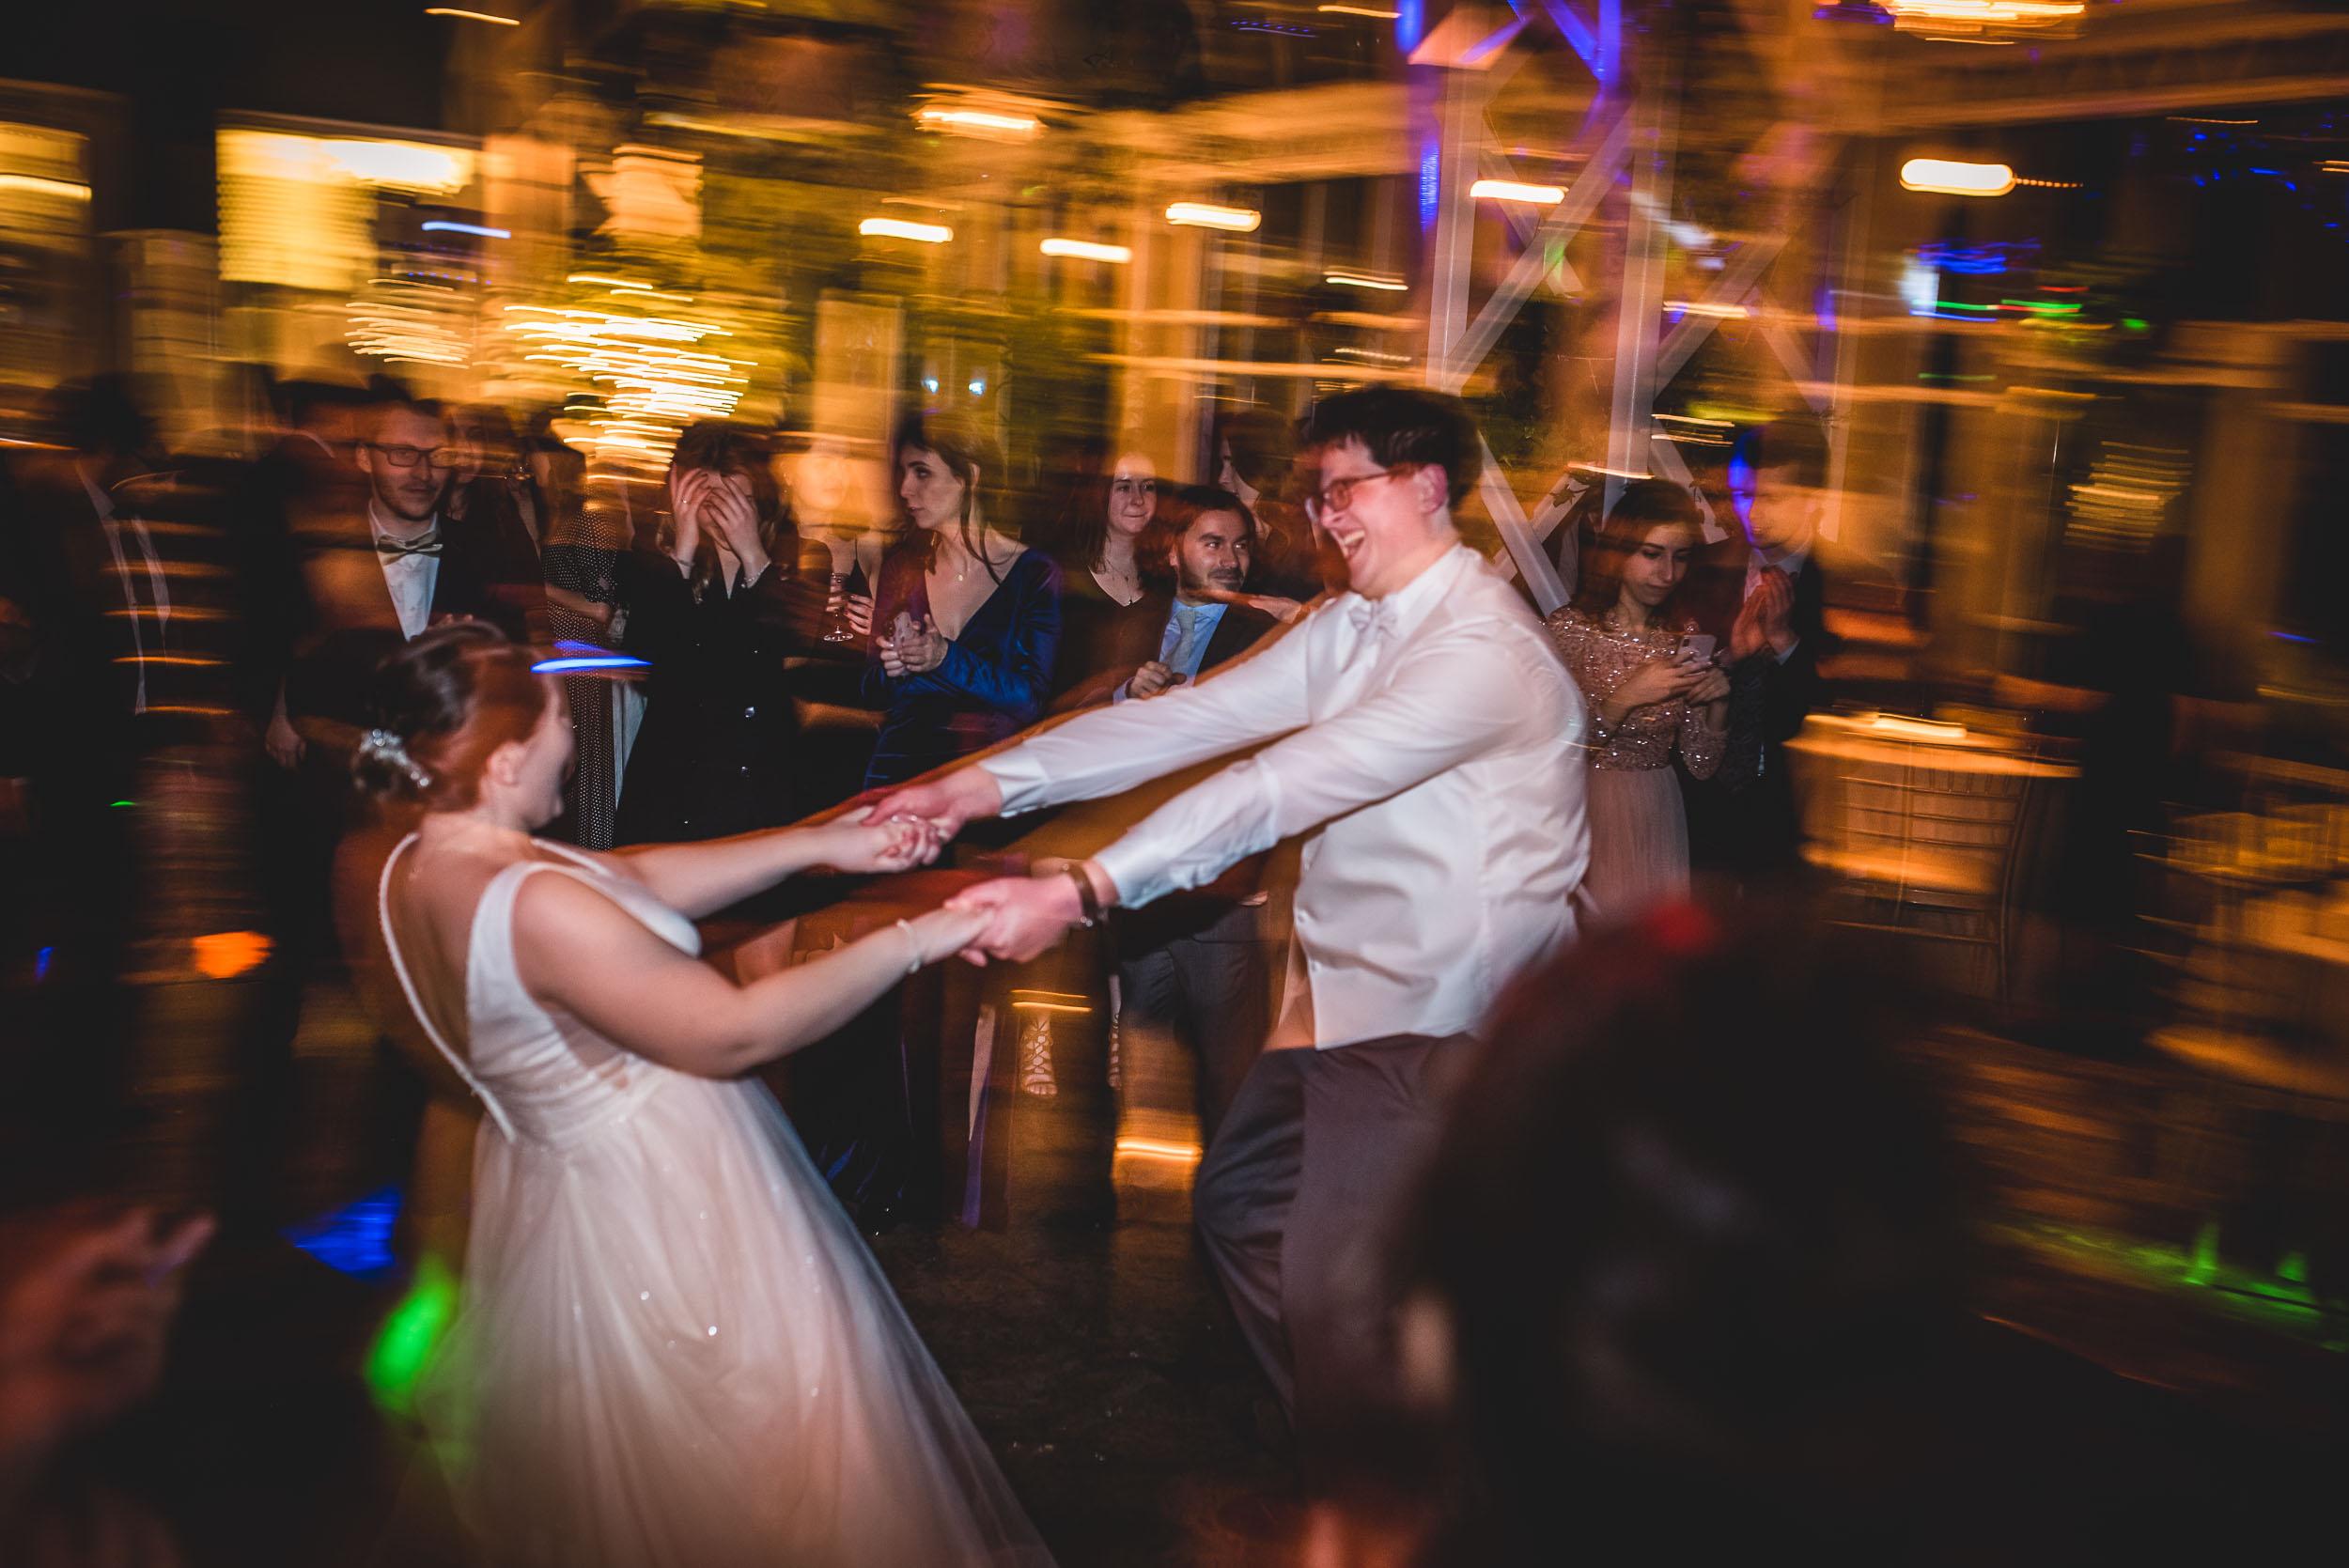 katie_mathia_wedding_Church_assumption_madison_hotel_morristown_new_jersey(9of1).jpg